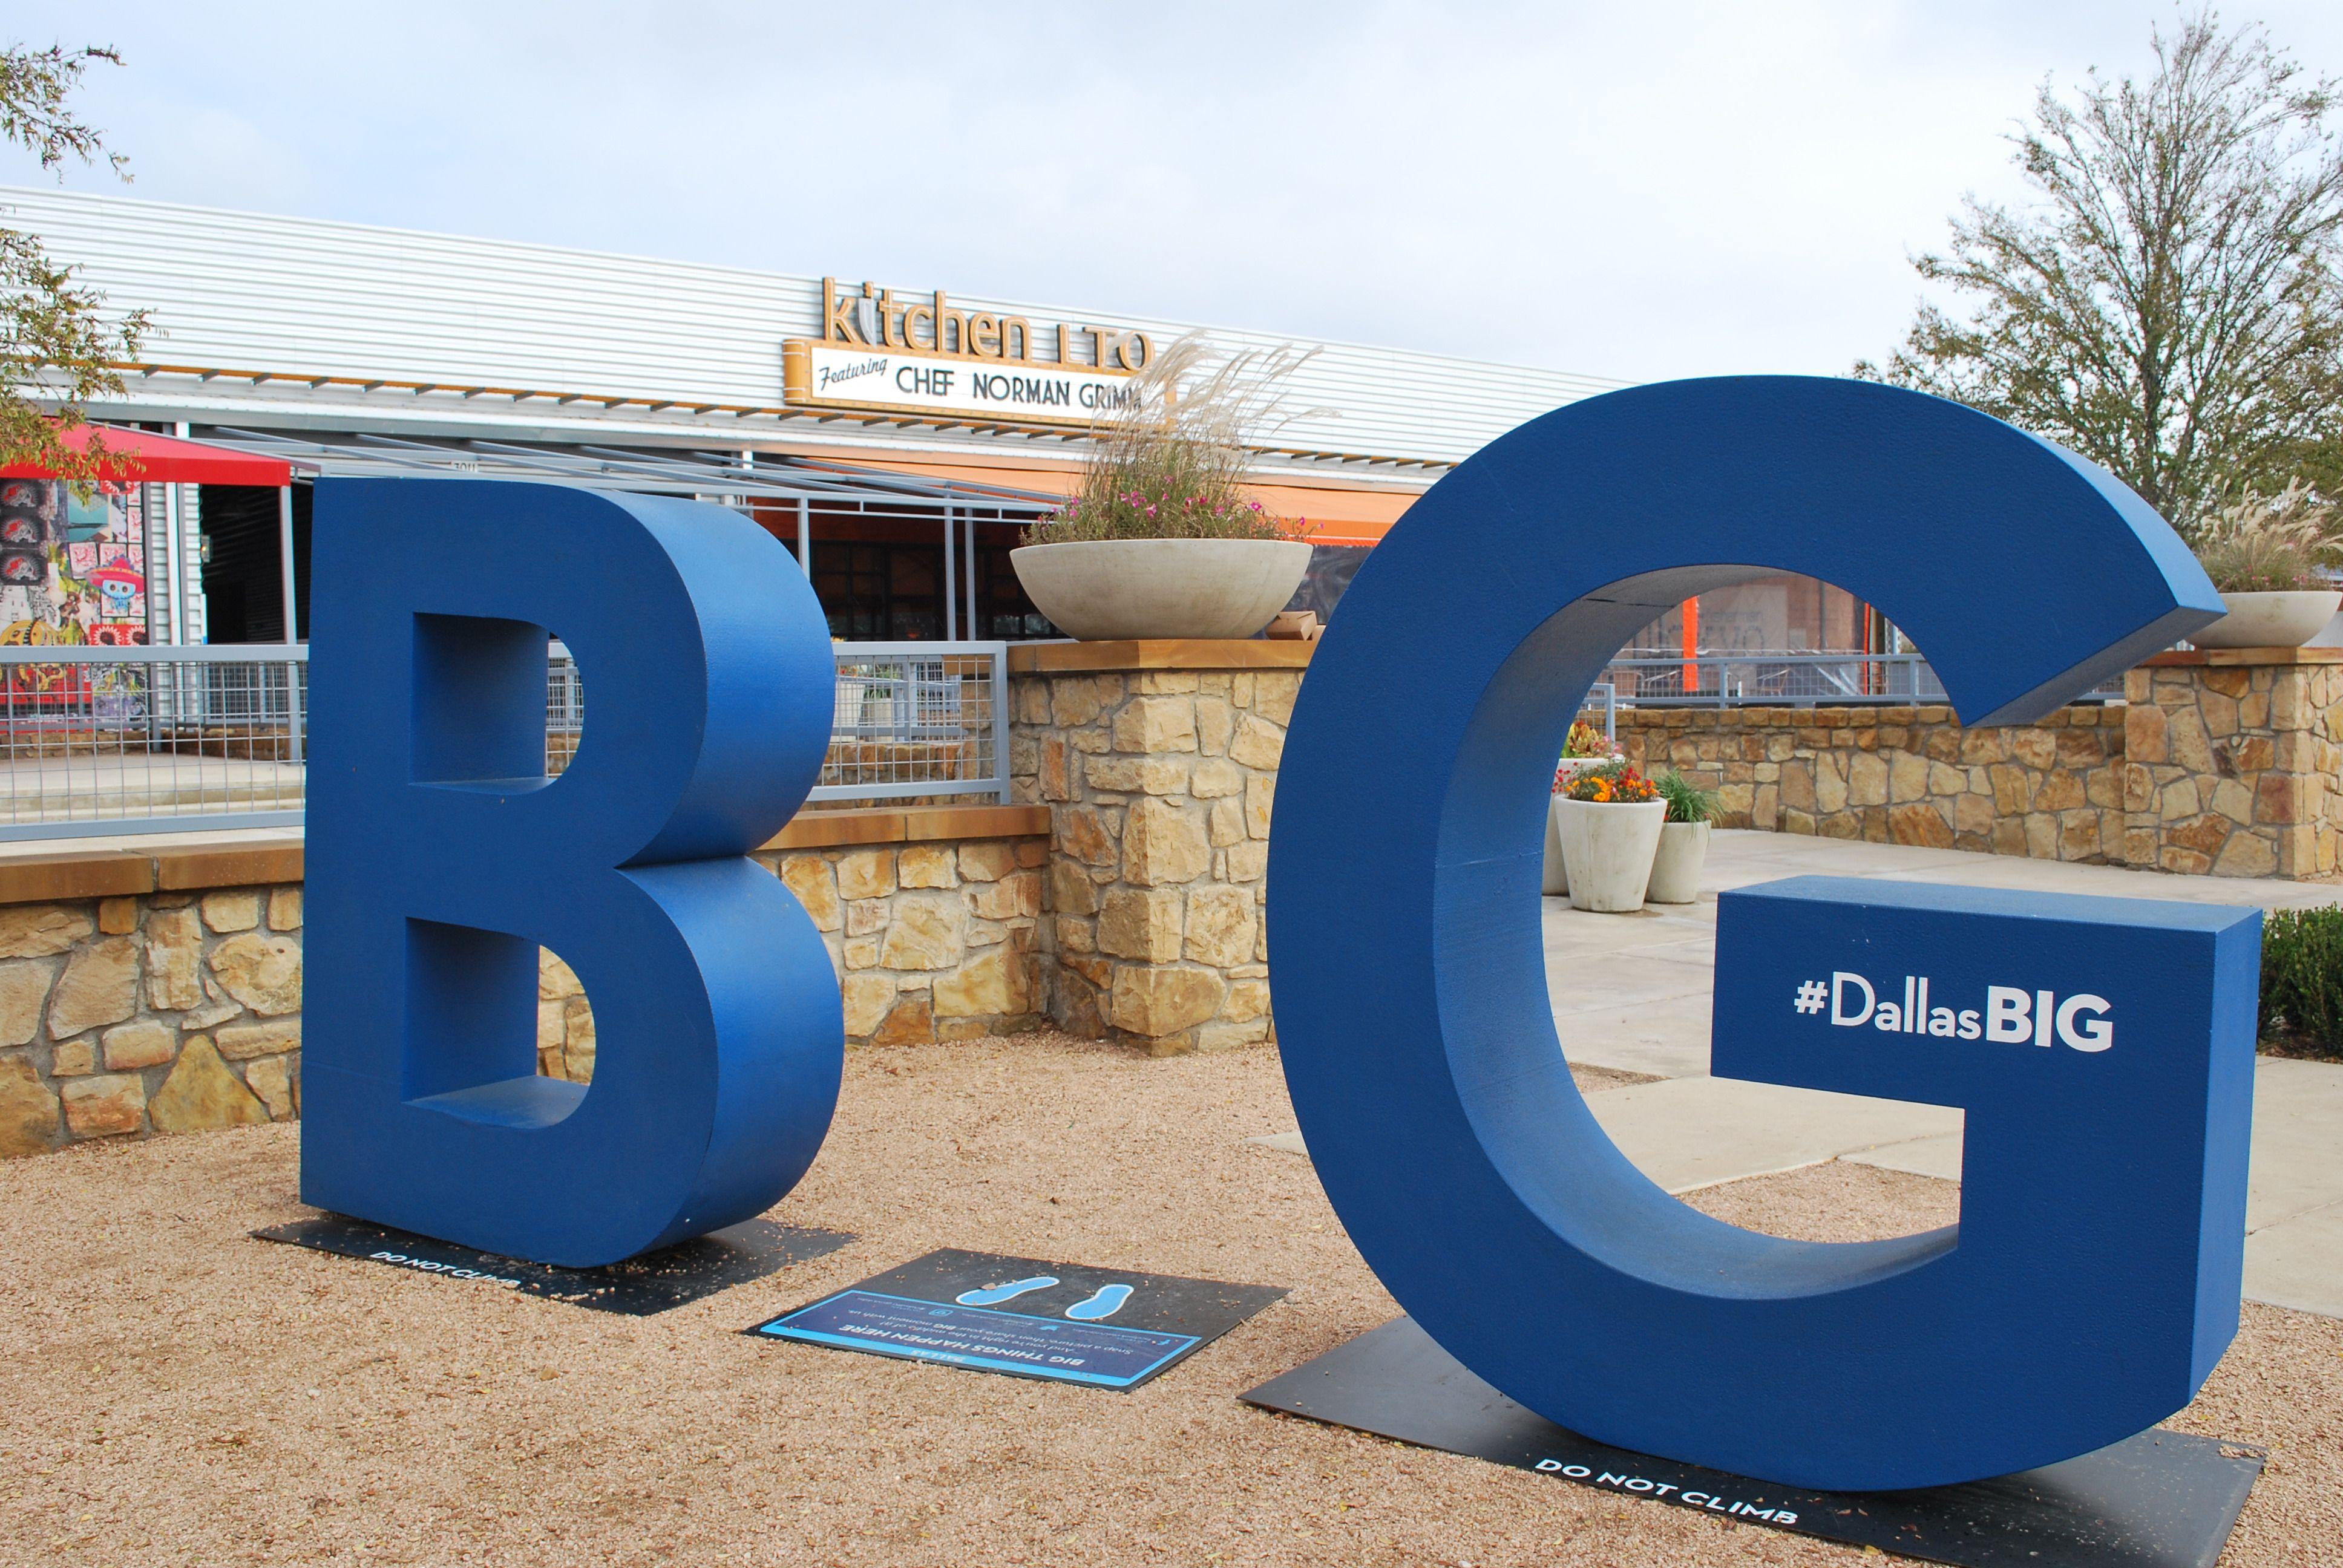 Dallas Big Big Trinity Groves Trinity Groves